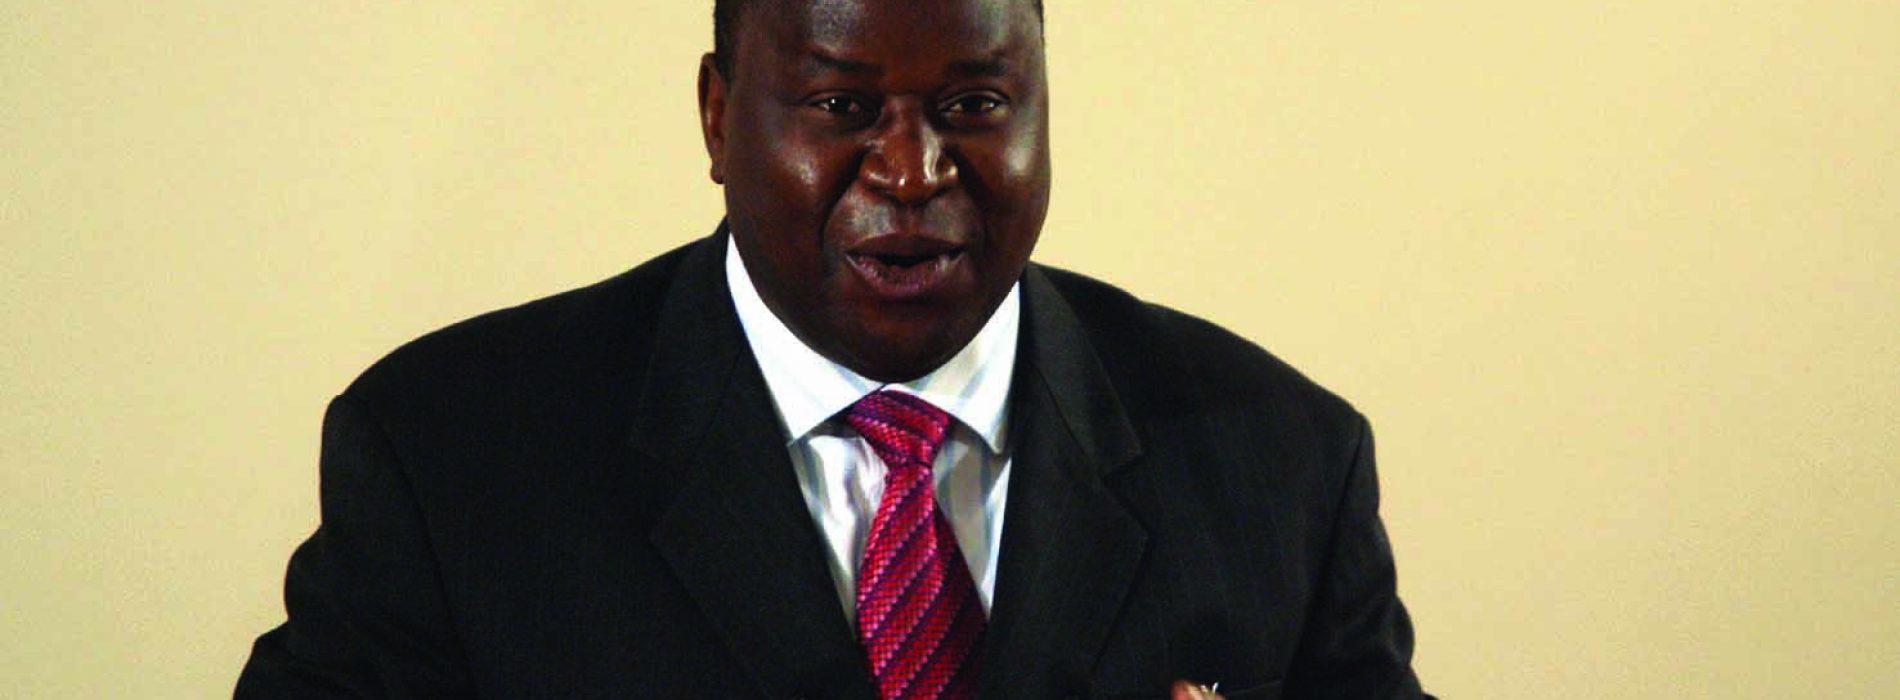 'West has no interest in Africa's development'